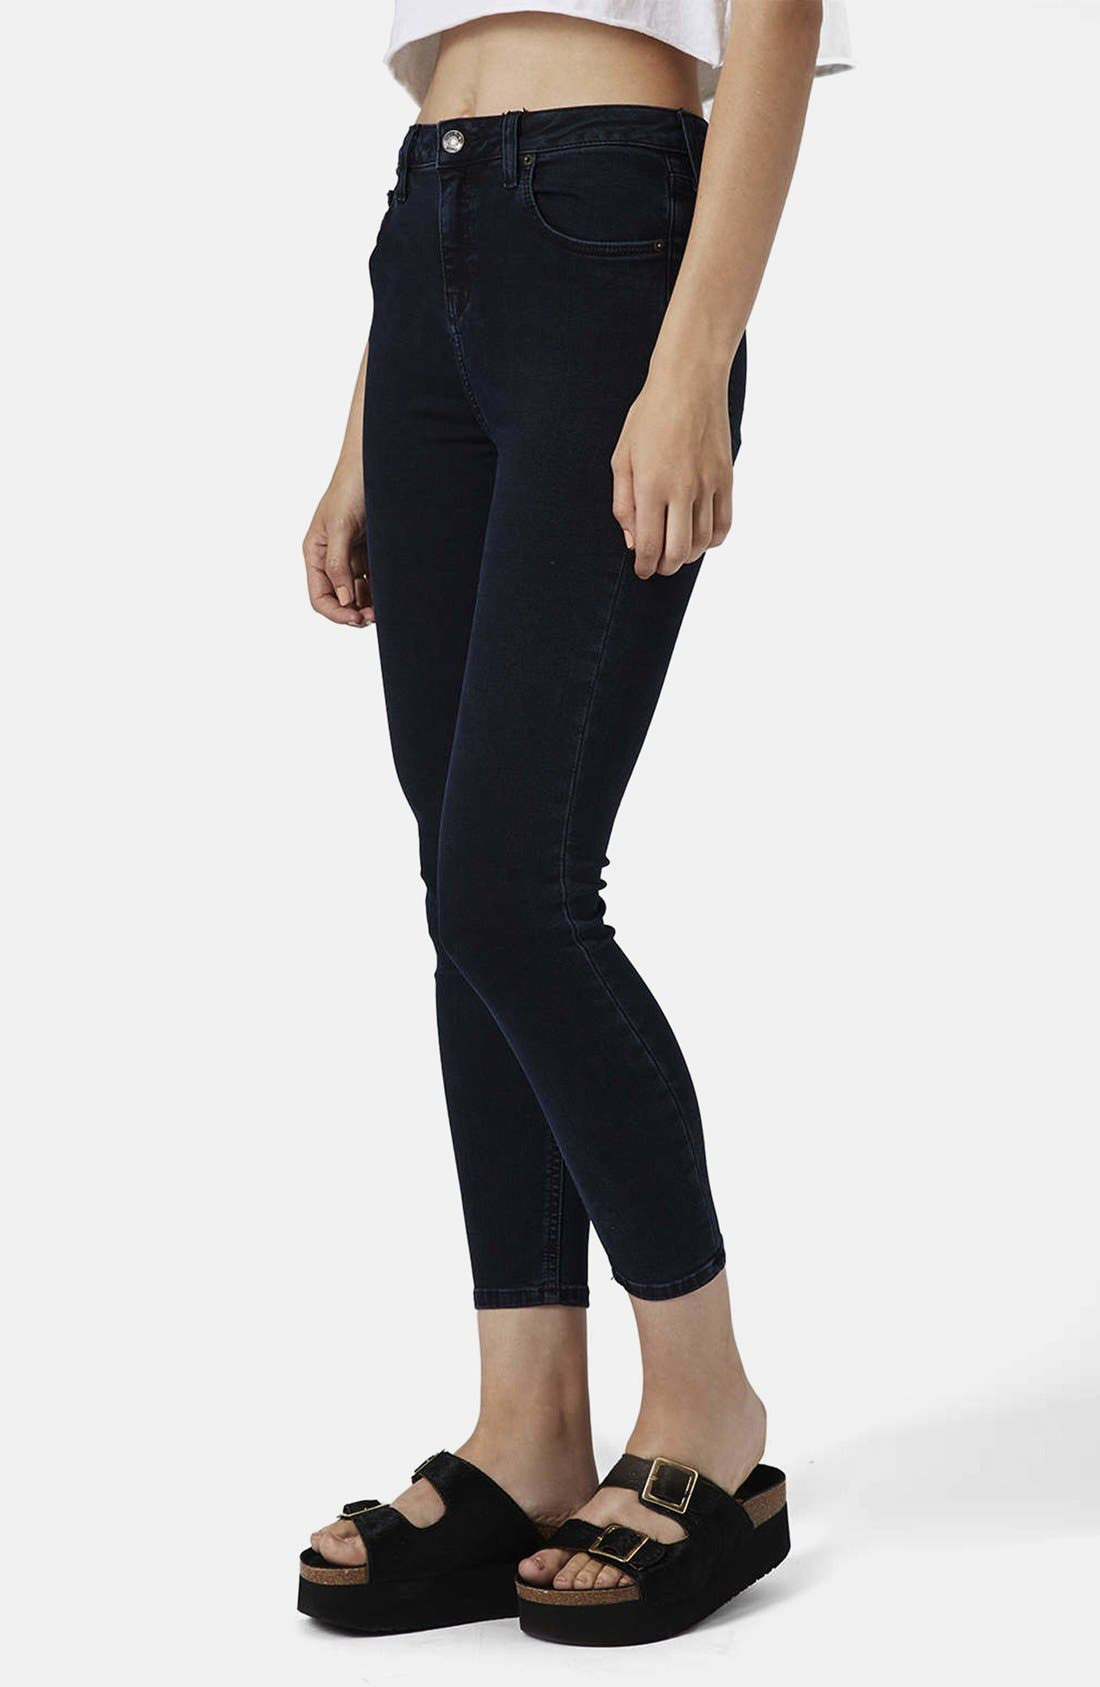 Alternate Image 1 Selected - Topshop Moto 'Jamie' High Rise Ankle Skinny Jeans (Blue Black) (Regular, Short & Long)